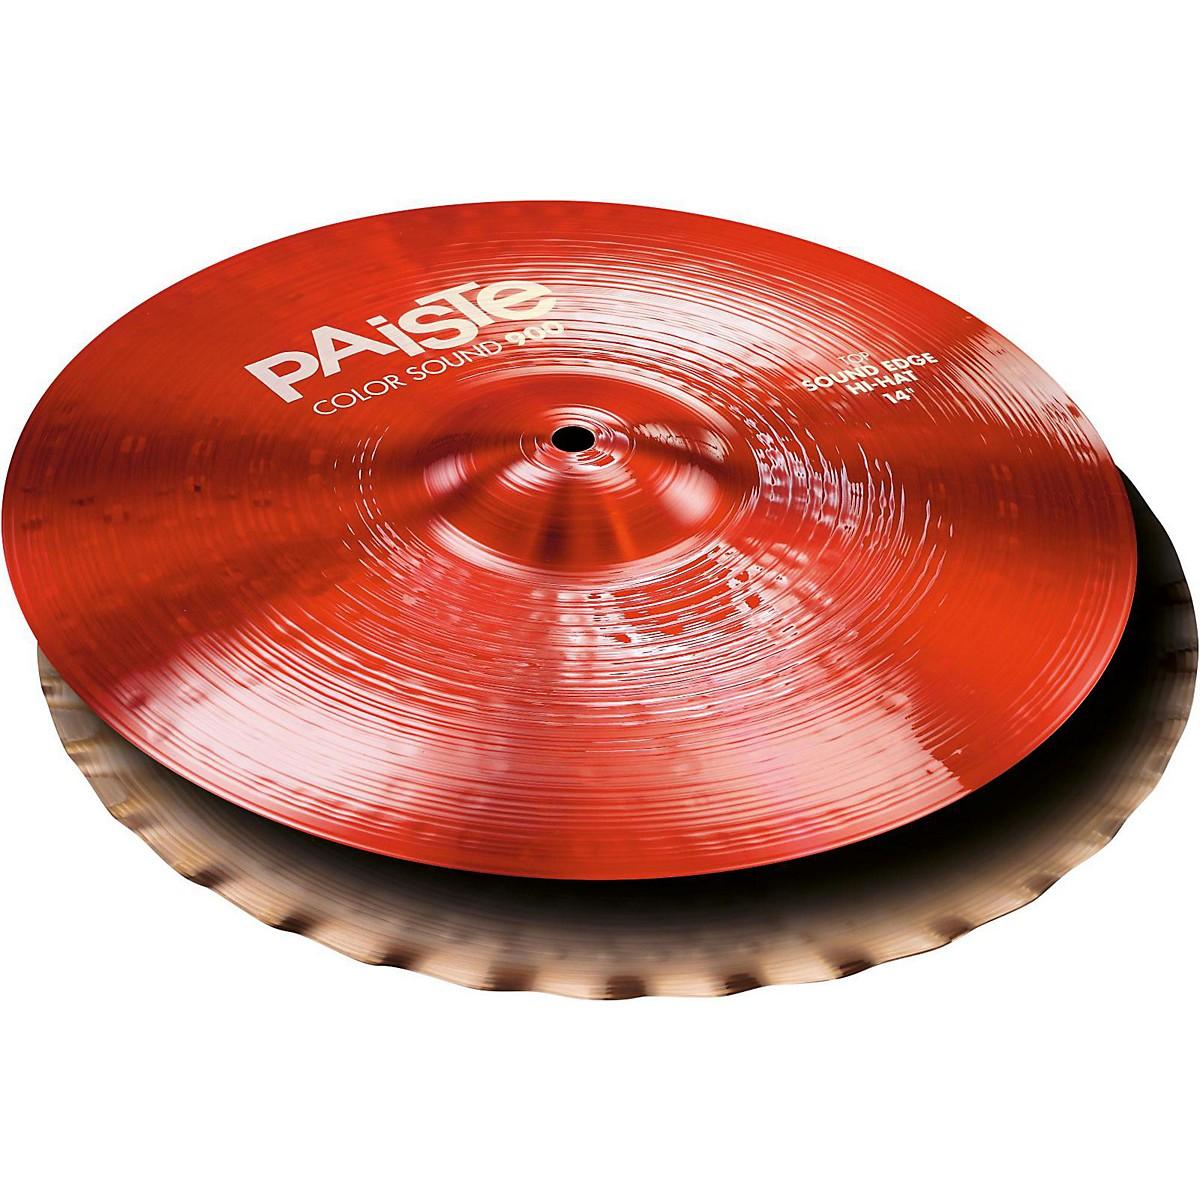 Paiste Colorsound 900 Sound Edge Hi Hat Cymbal Red